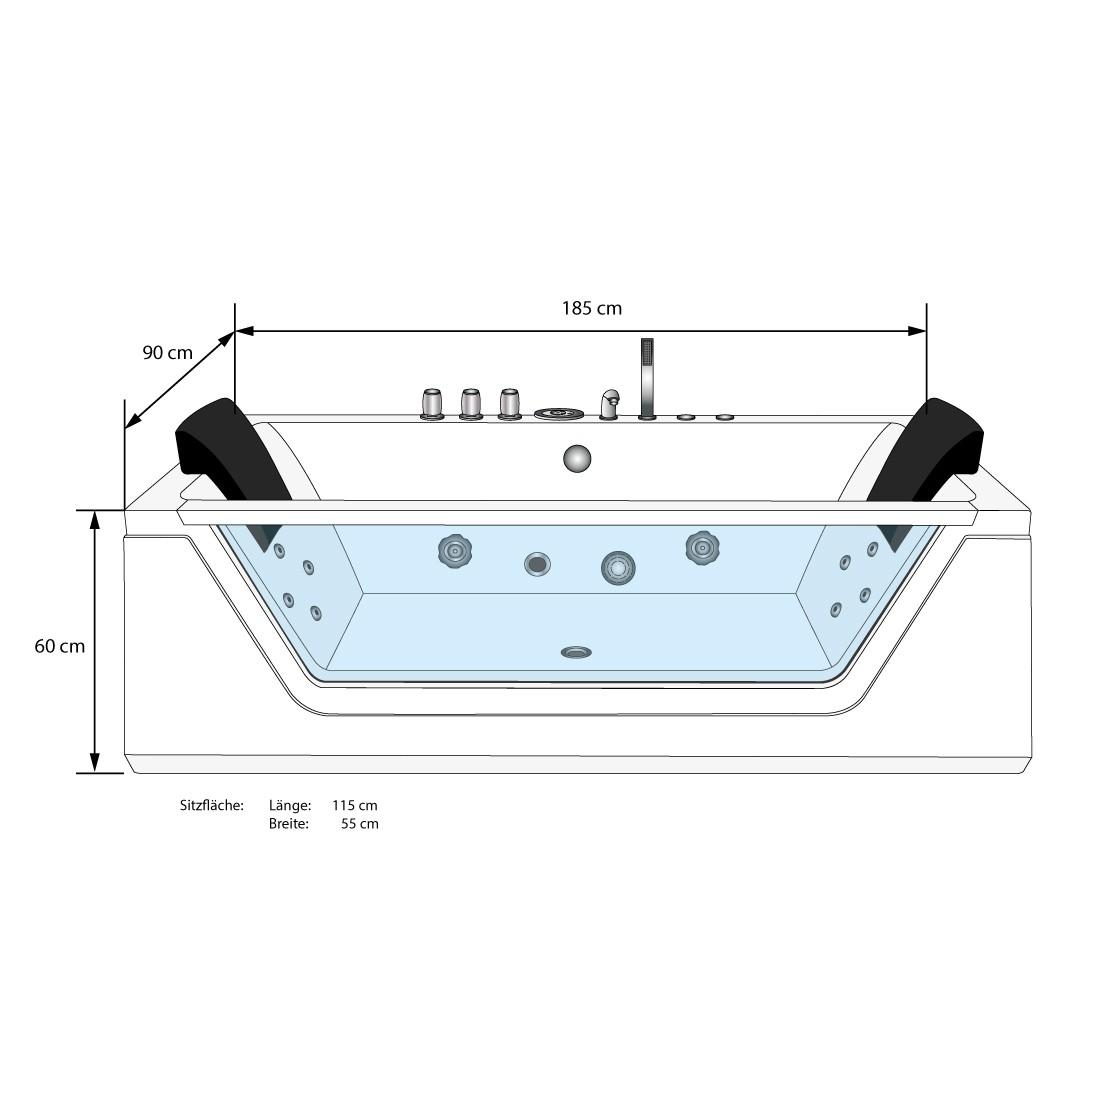 [Paket] AcquaVapore Whirlpool Pool Badewanne Wanne A1813NB mit  Reinigungsfunktion 90x185